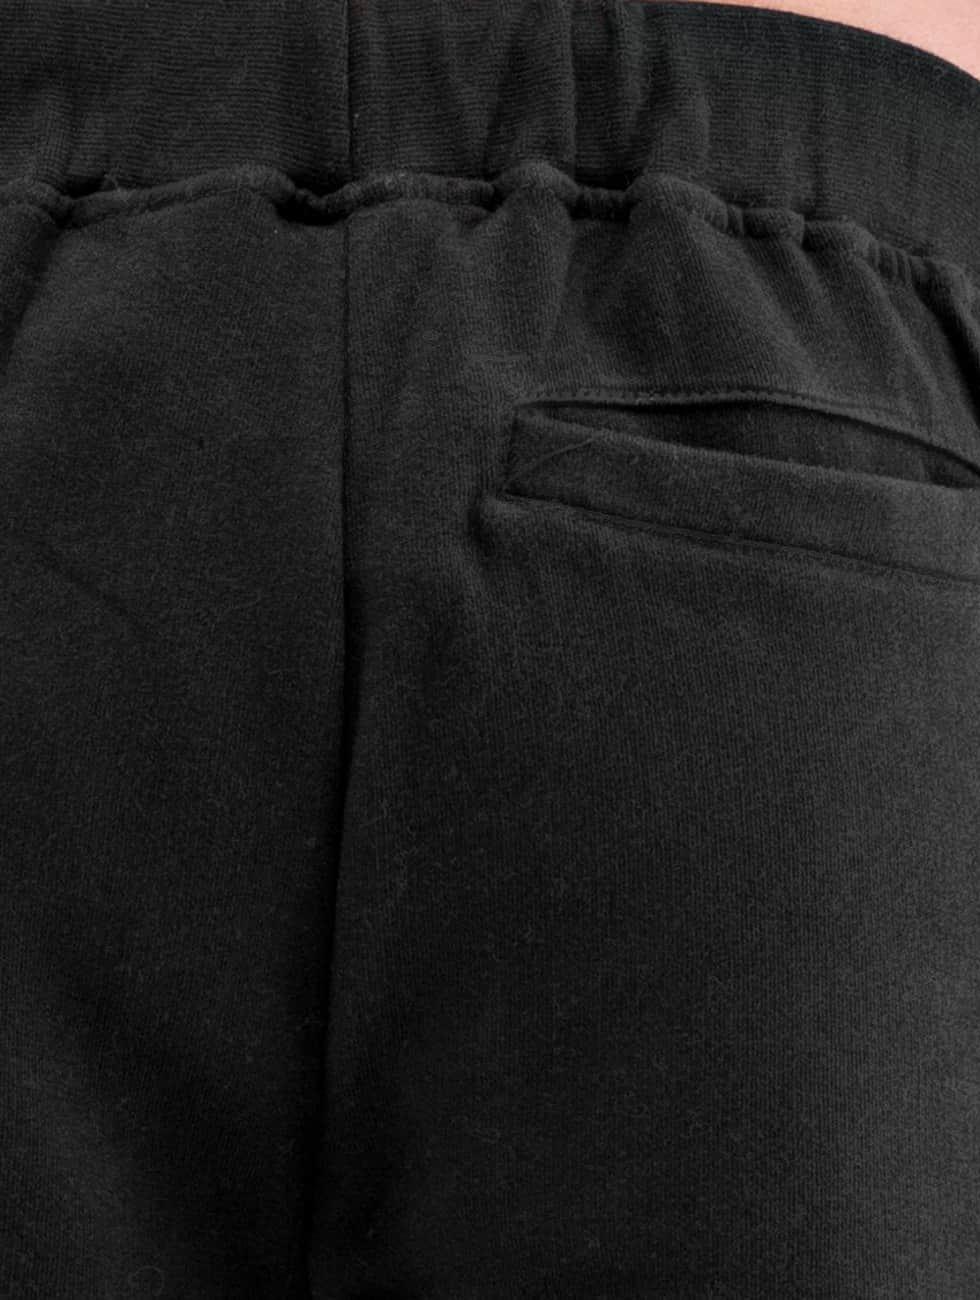 Pelle Pelle joggingbroek Tapemasters zwart